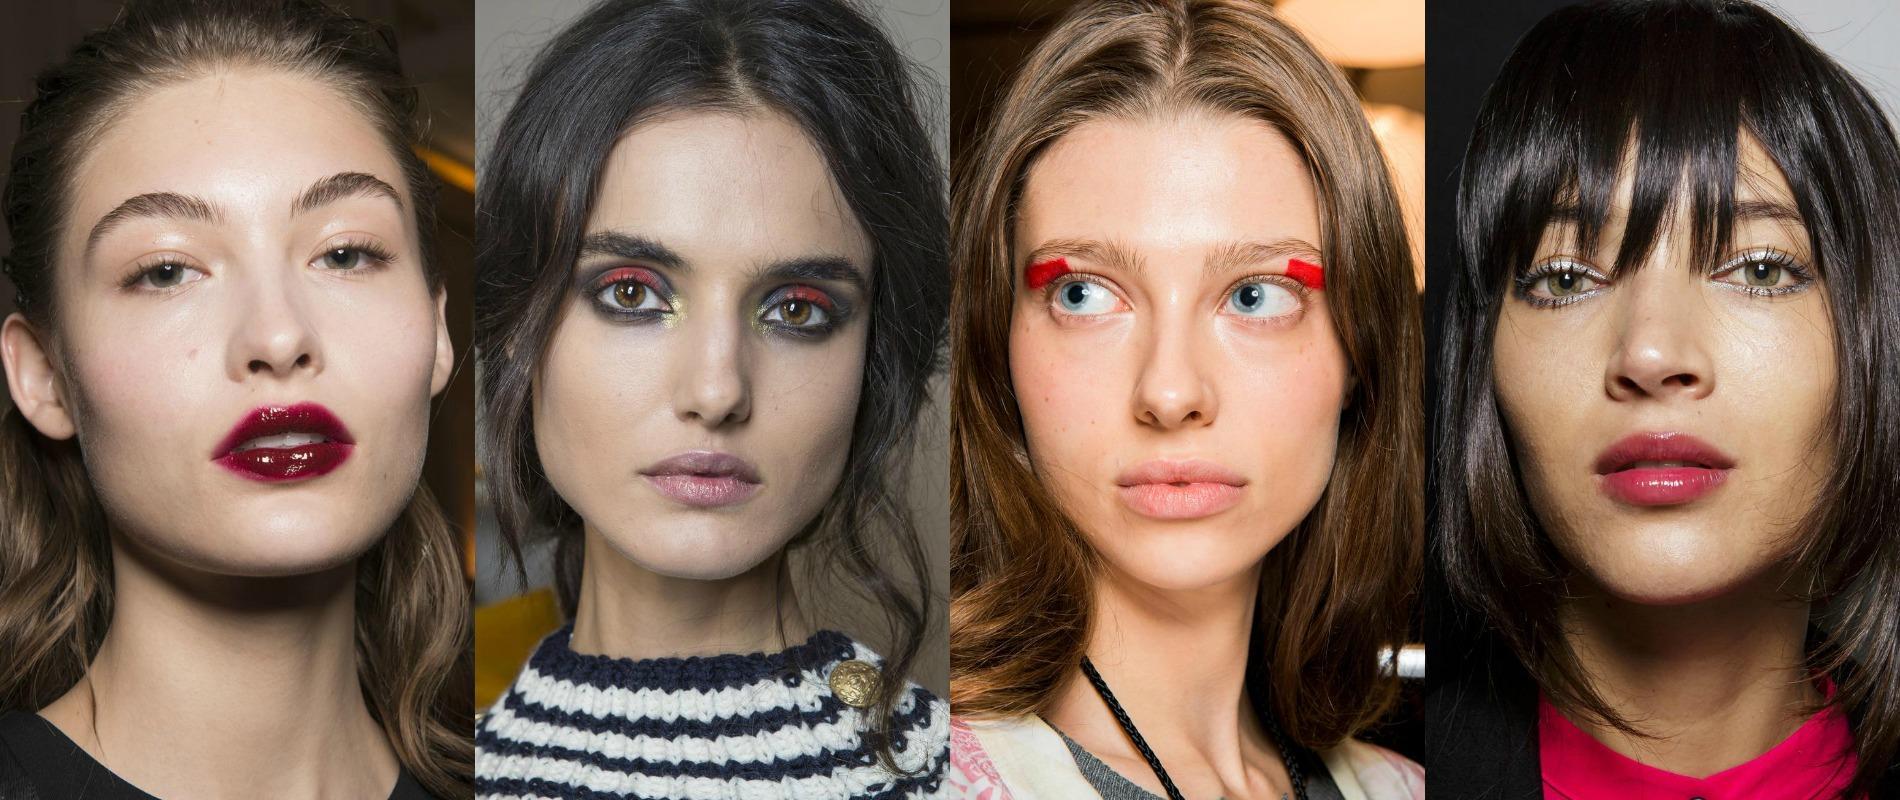 Quelles tendances maquillage allons nous adopter cet hiver madame figaro - Maquillage automne 2017 ...